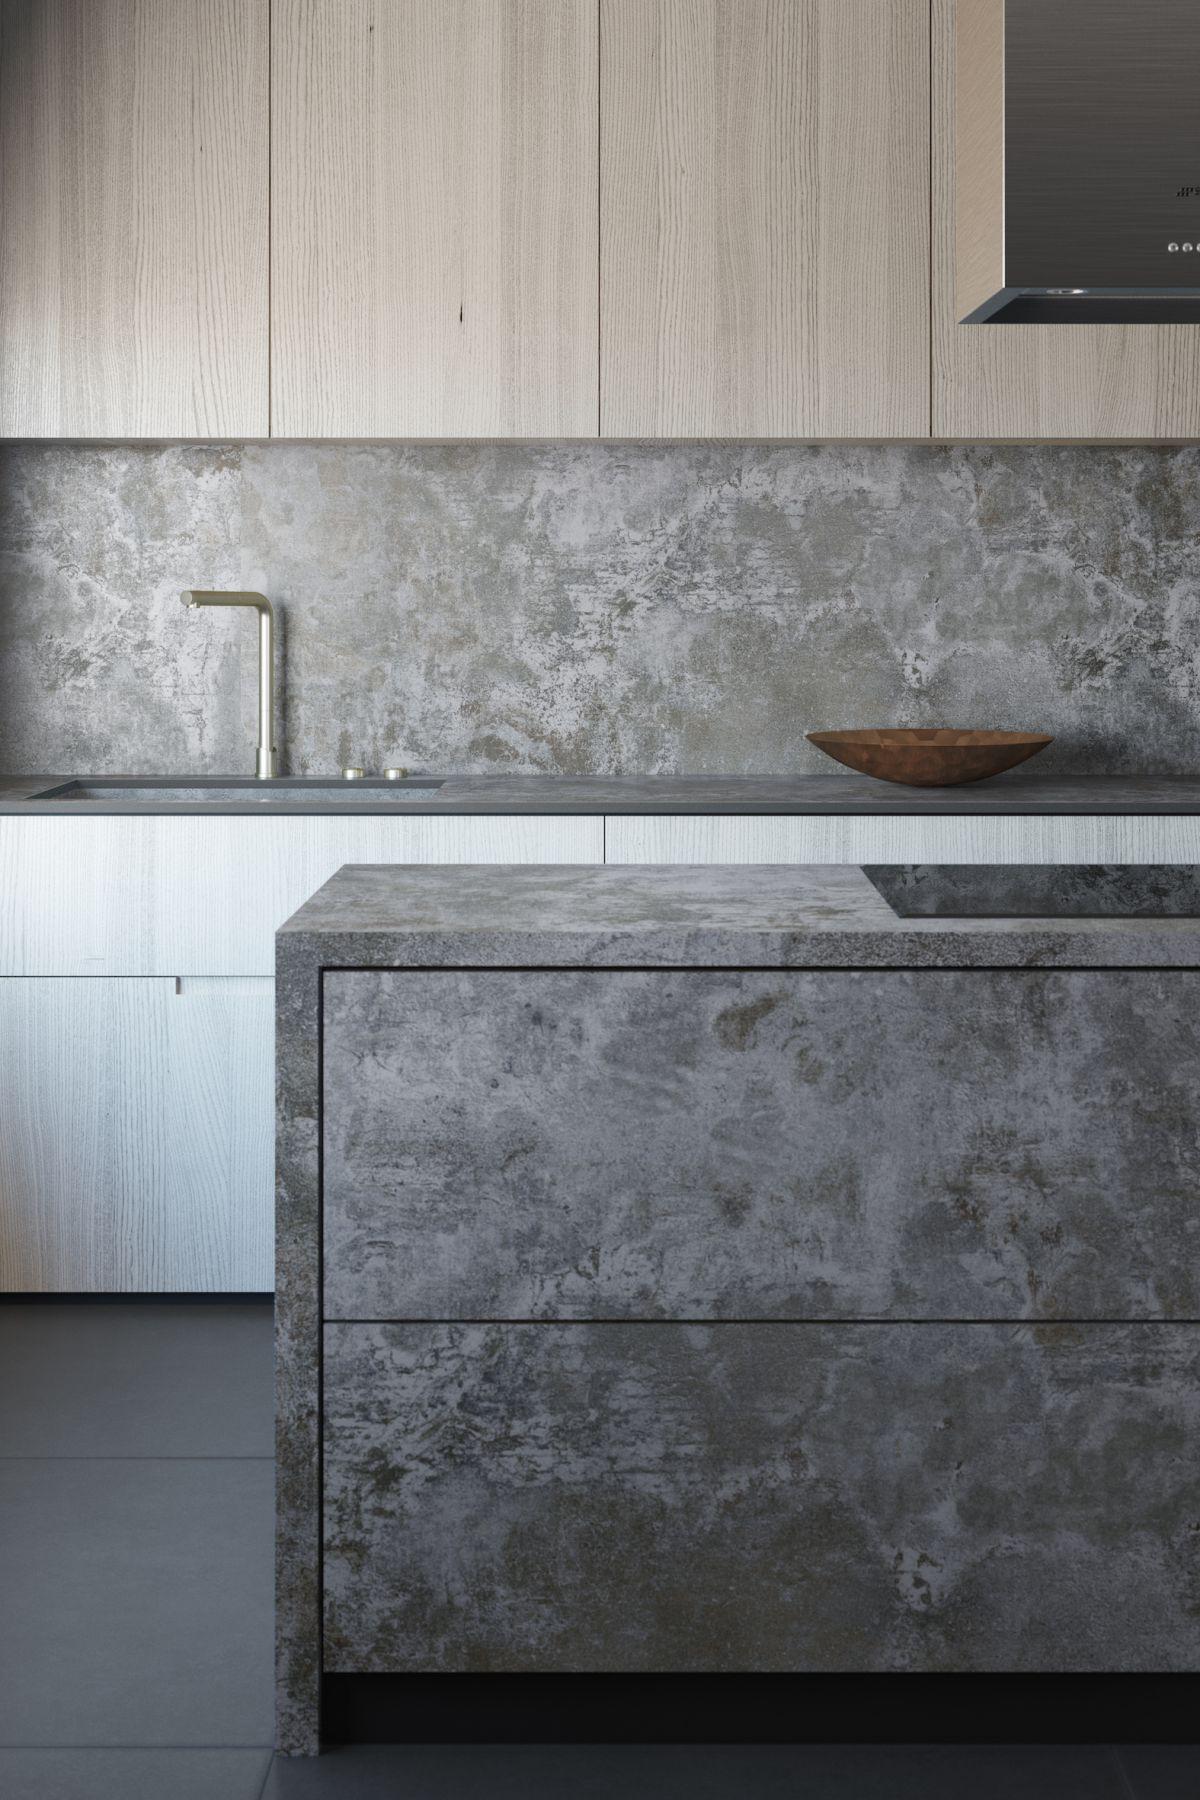 Kitchen Splashback Ideas 20 Looks You Ll Love Real Homes